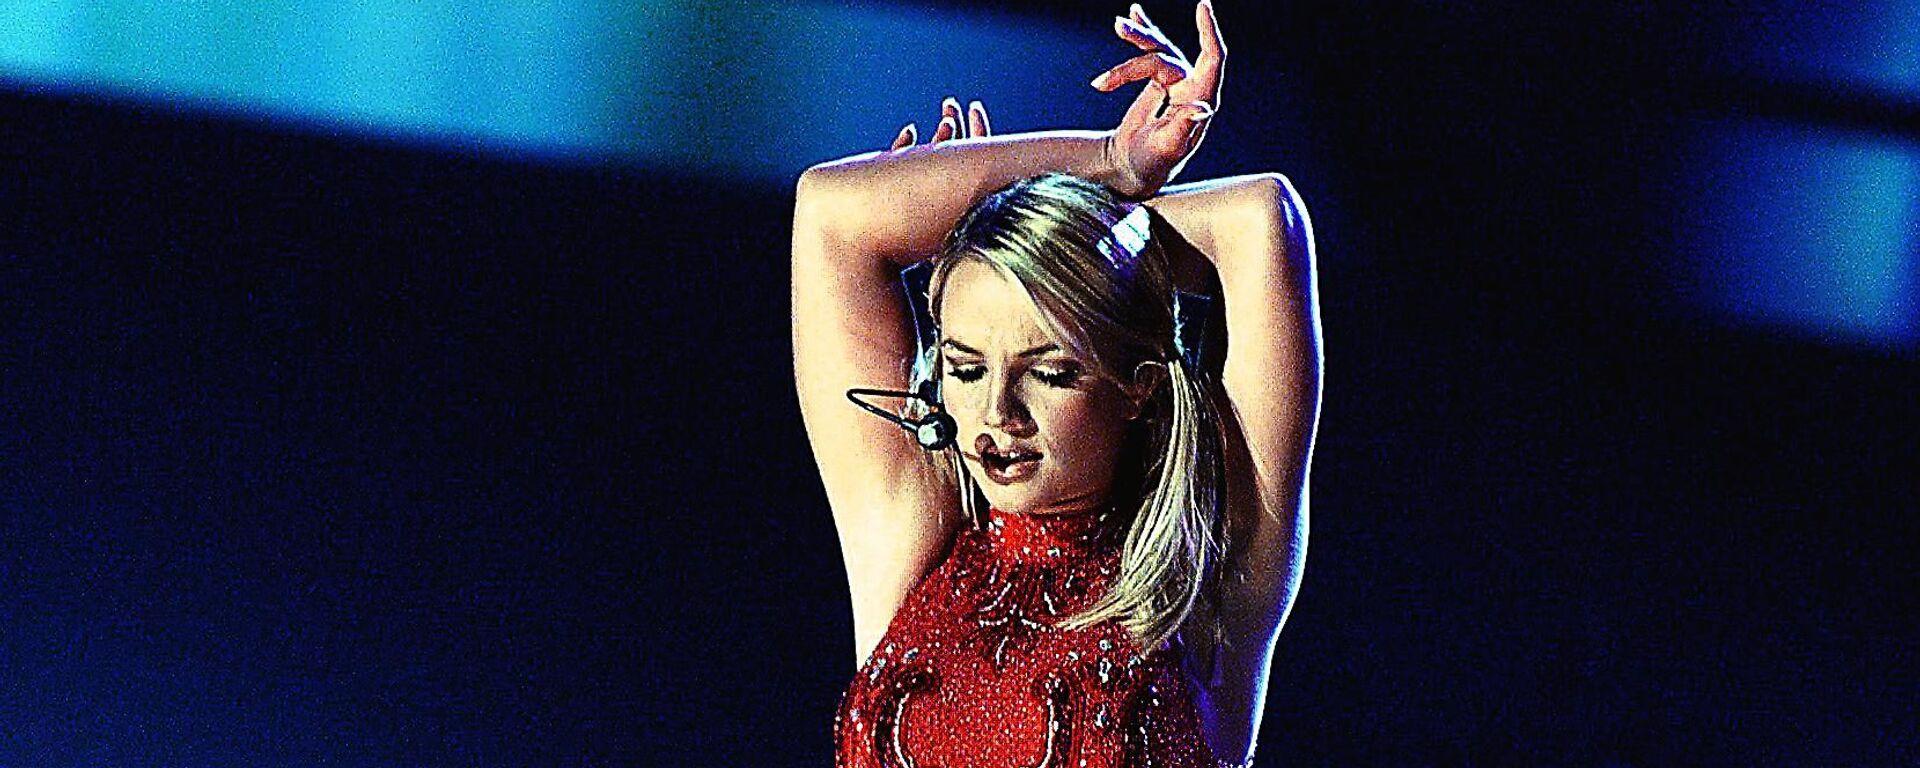 La cantante Britney Spears en febrero de 2000 - Sputnik Mundo, 1920, 24.02.2021